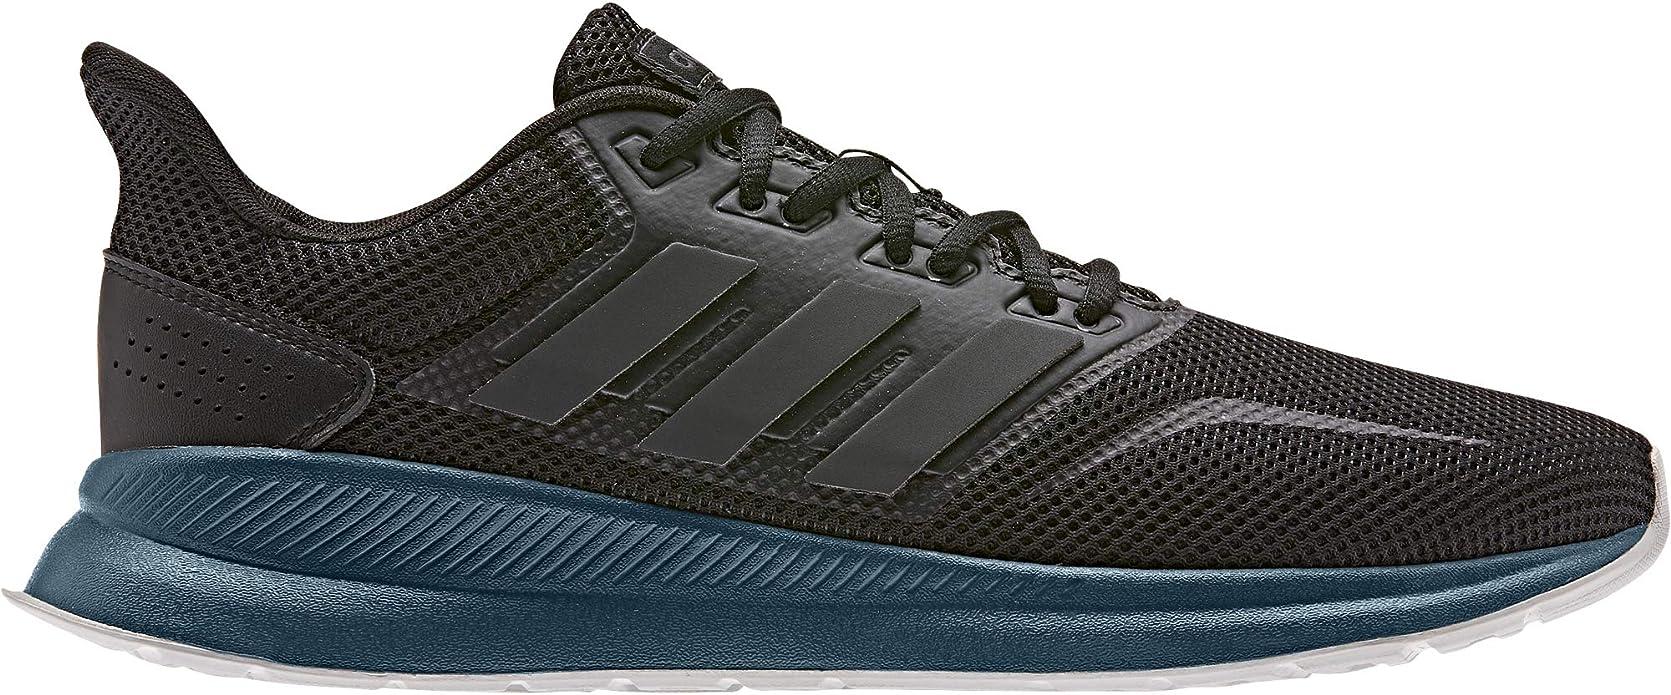 41 World Industries Shoes MOTO Gr US 8 Sneaker Schuhe Sportschuhe